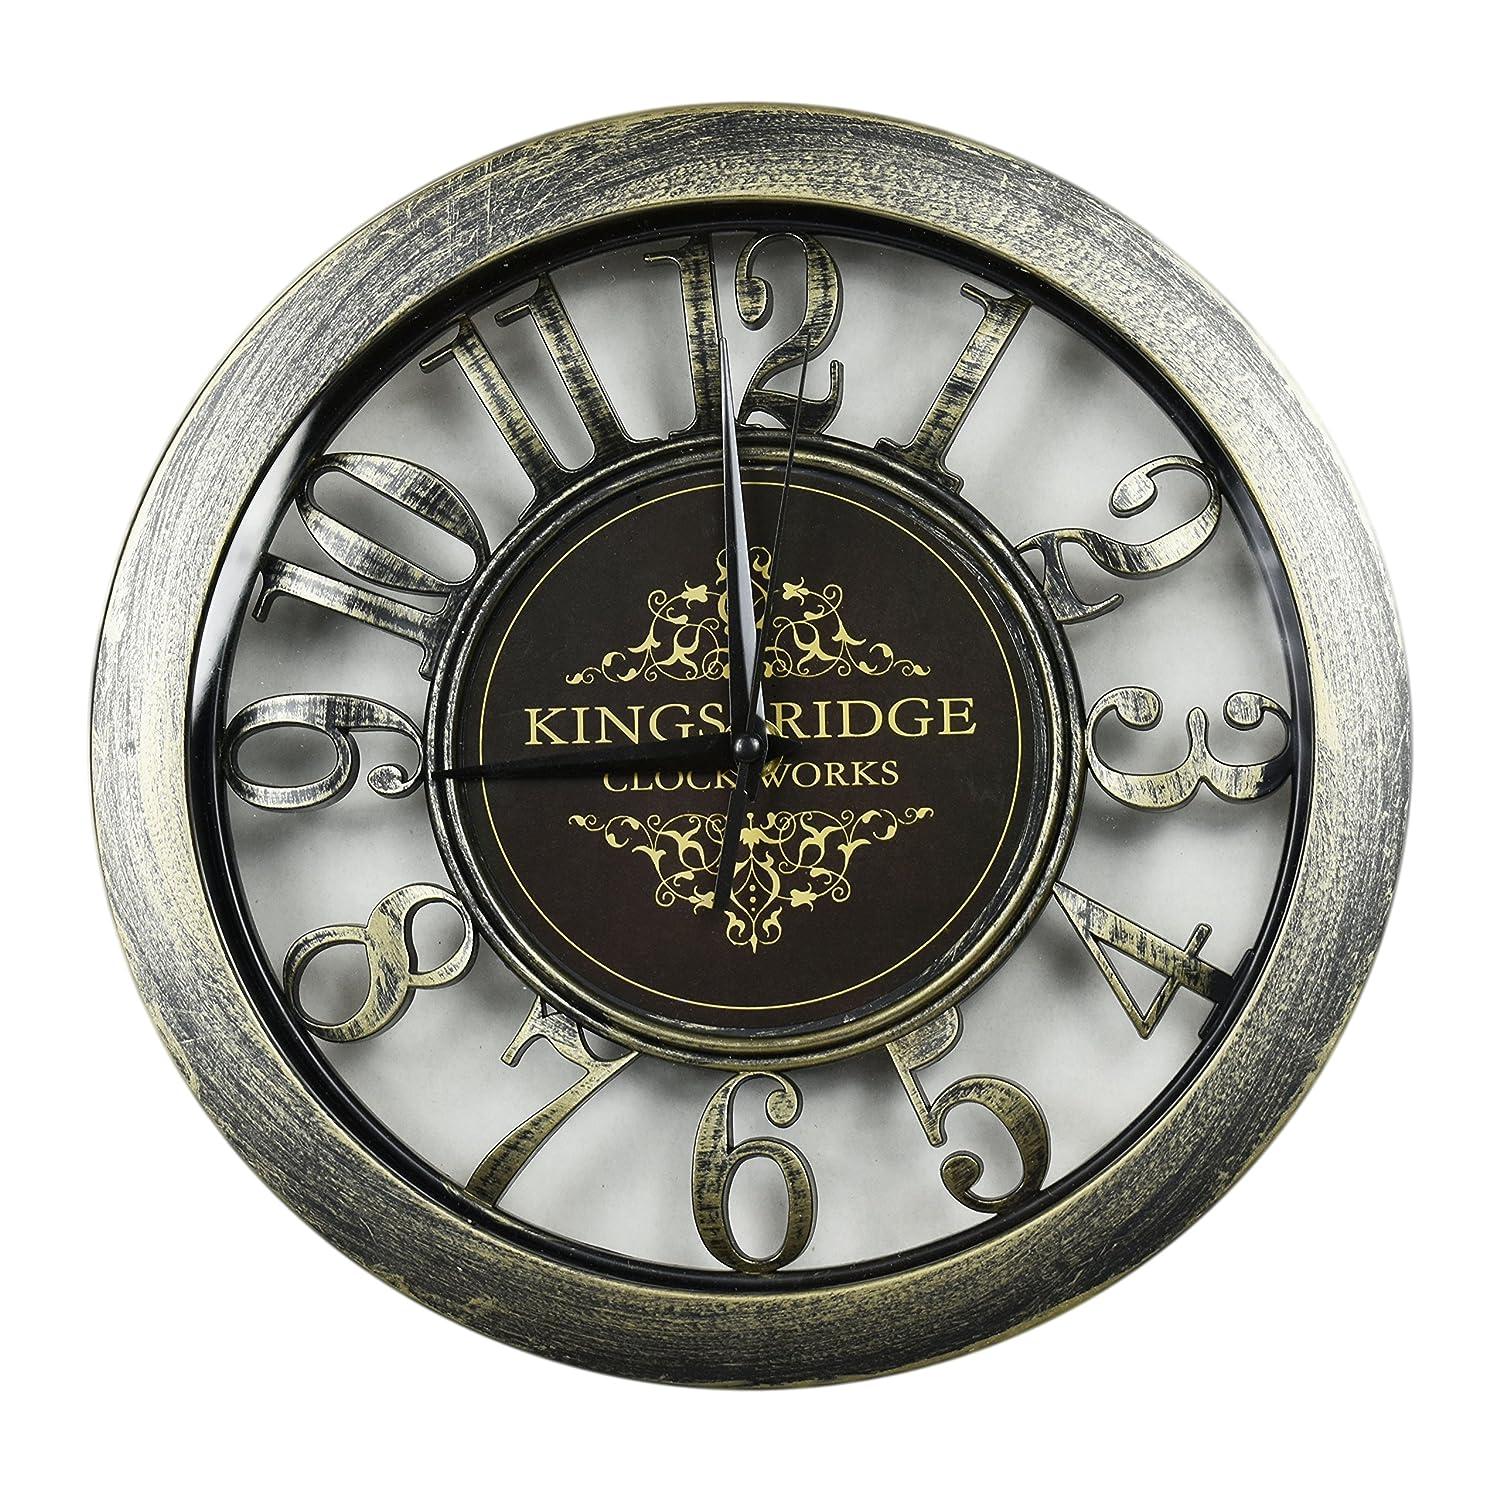 Single KingsBridge ClockWorks 11 Analog Wall Clock 1 Painted Brushed Dark Brass Classy Design